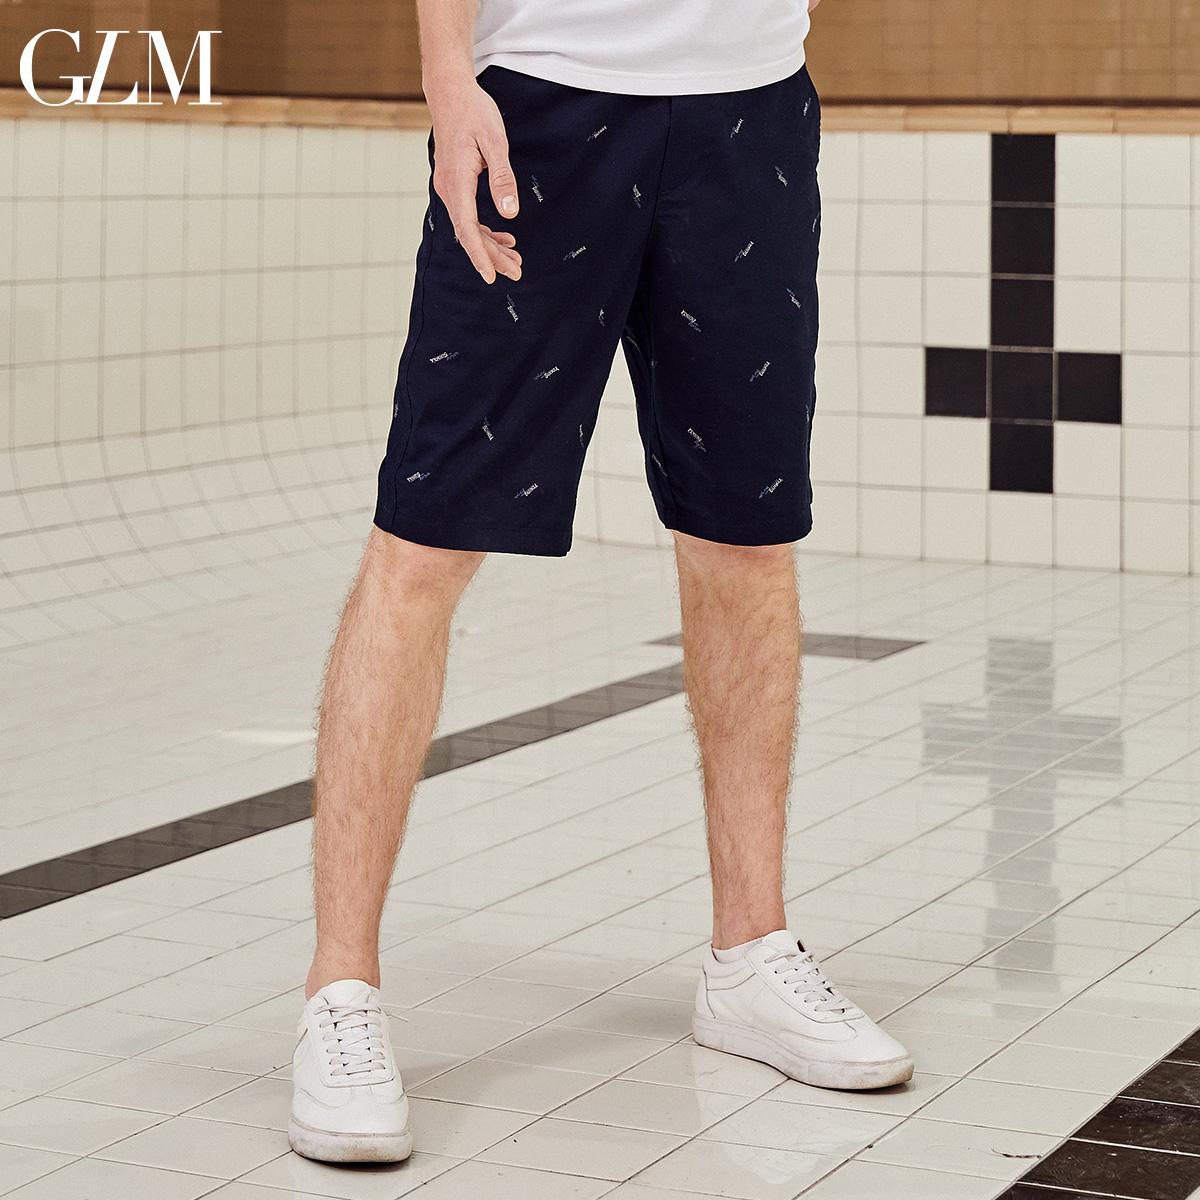 GLM男装2019夏季新款满印刺绣休闲短裤薄款修身五分裤子青年